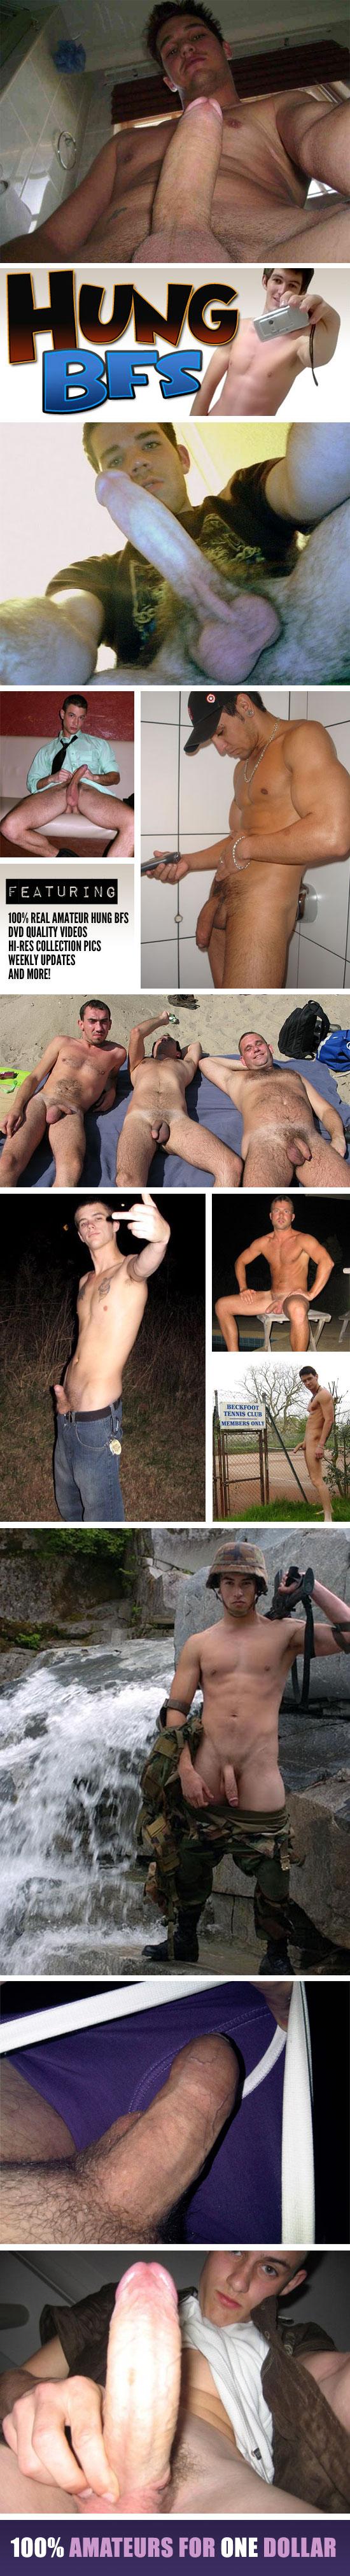 Straight amateur boys going nude